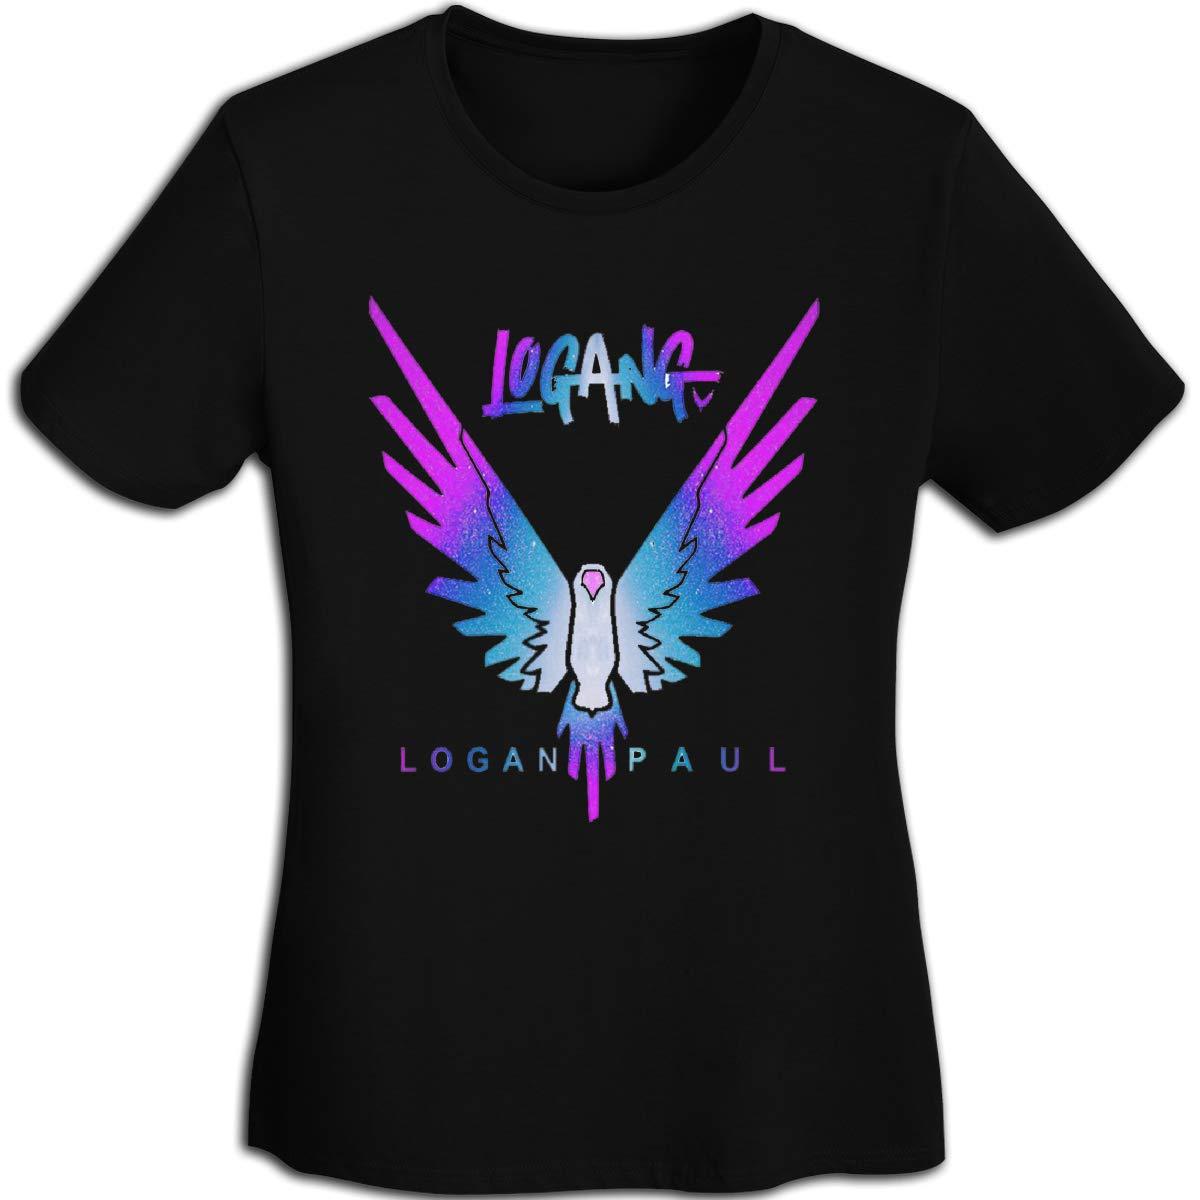 Women's T Shirt Jake Paul Logang Logan Paul Maverick Tee Shirts T-Shirt Short-Sleeve Round Neck Tshirt for Womens Girls Black M by BKashy